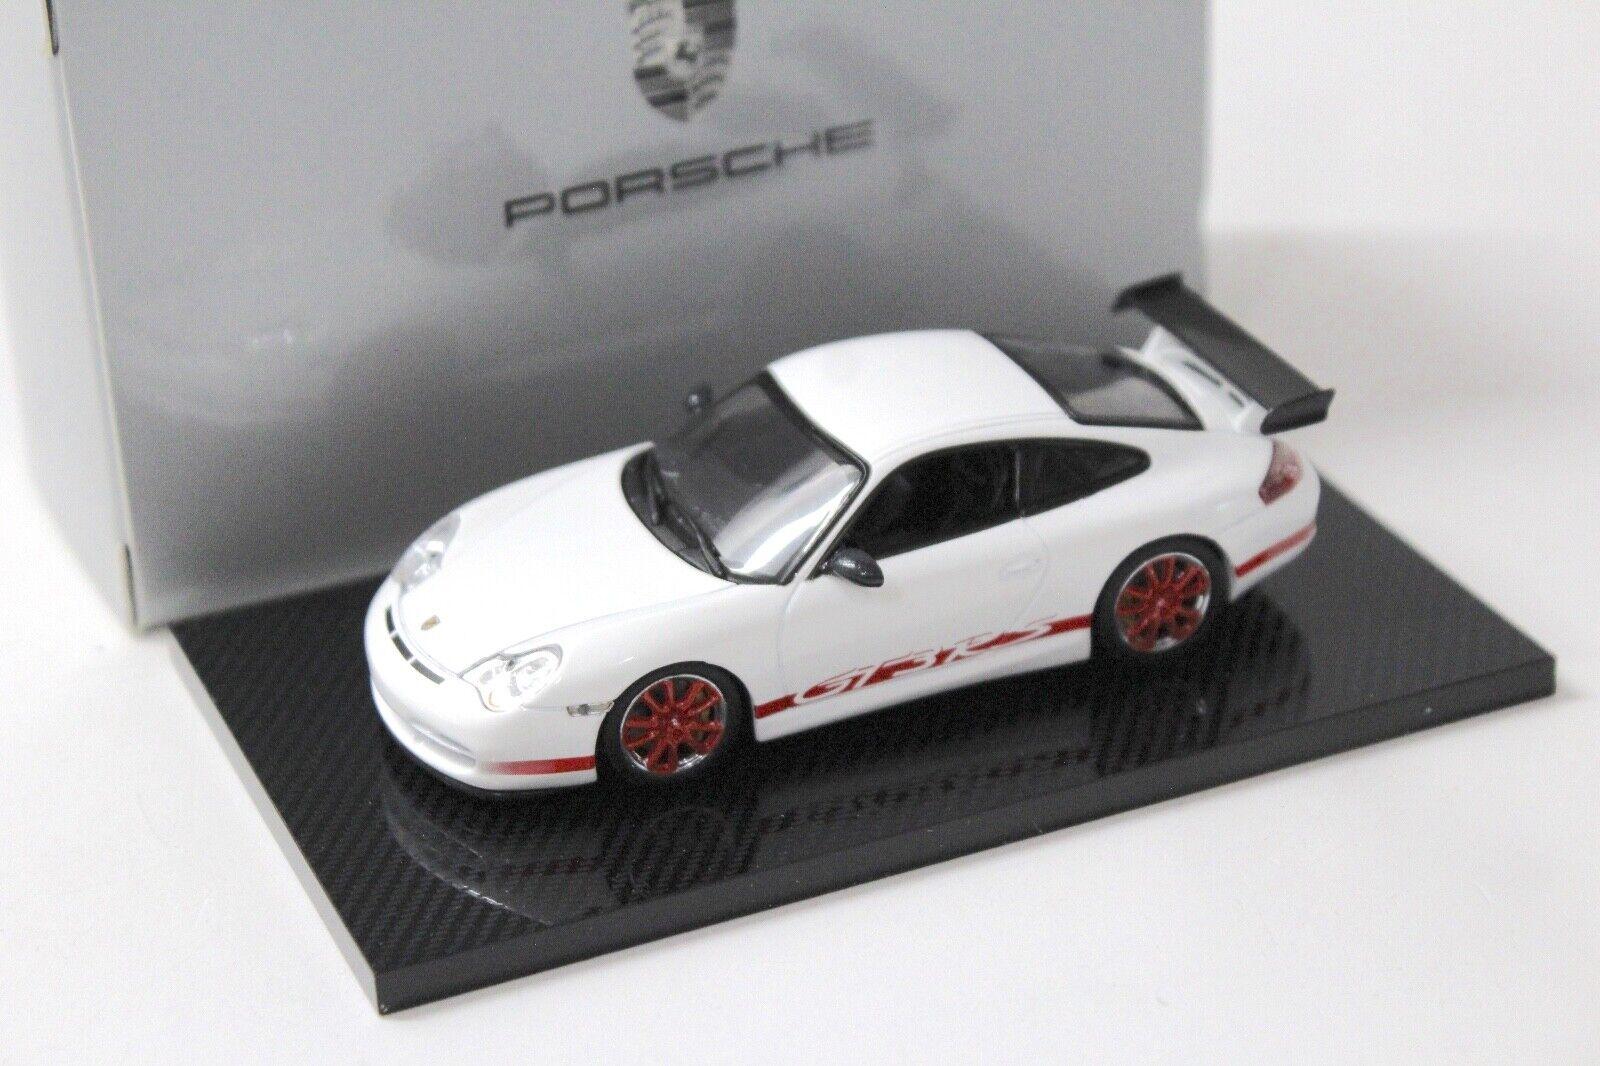 1 43 Minichamps Porsche 911 996 GT3 RS WHITE RED DEALER NEW in Premium Car